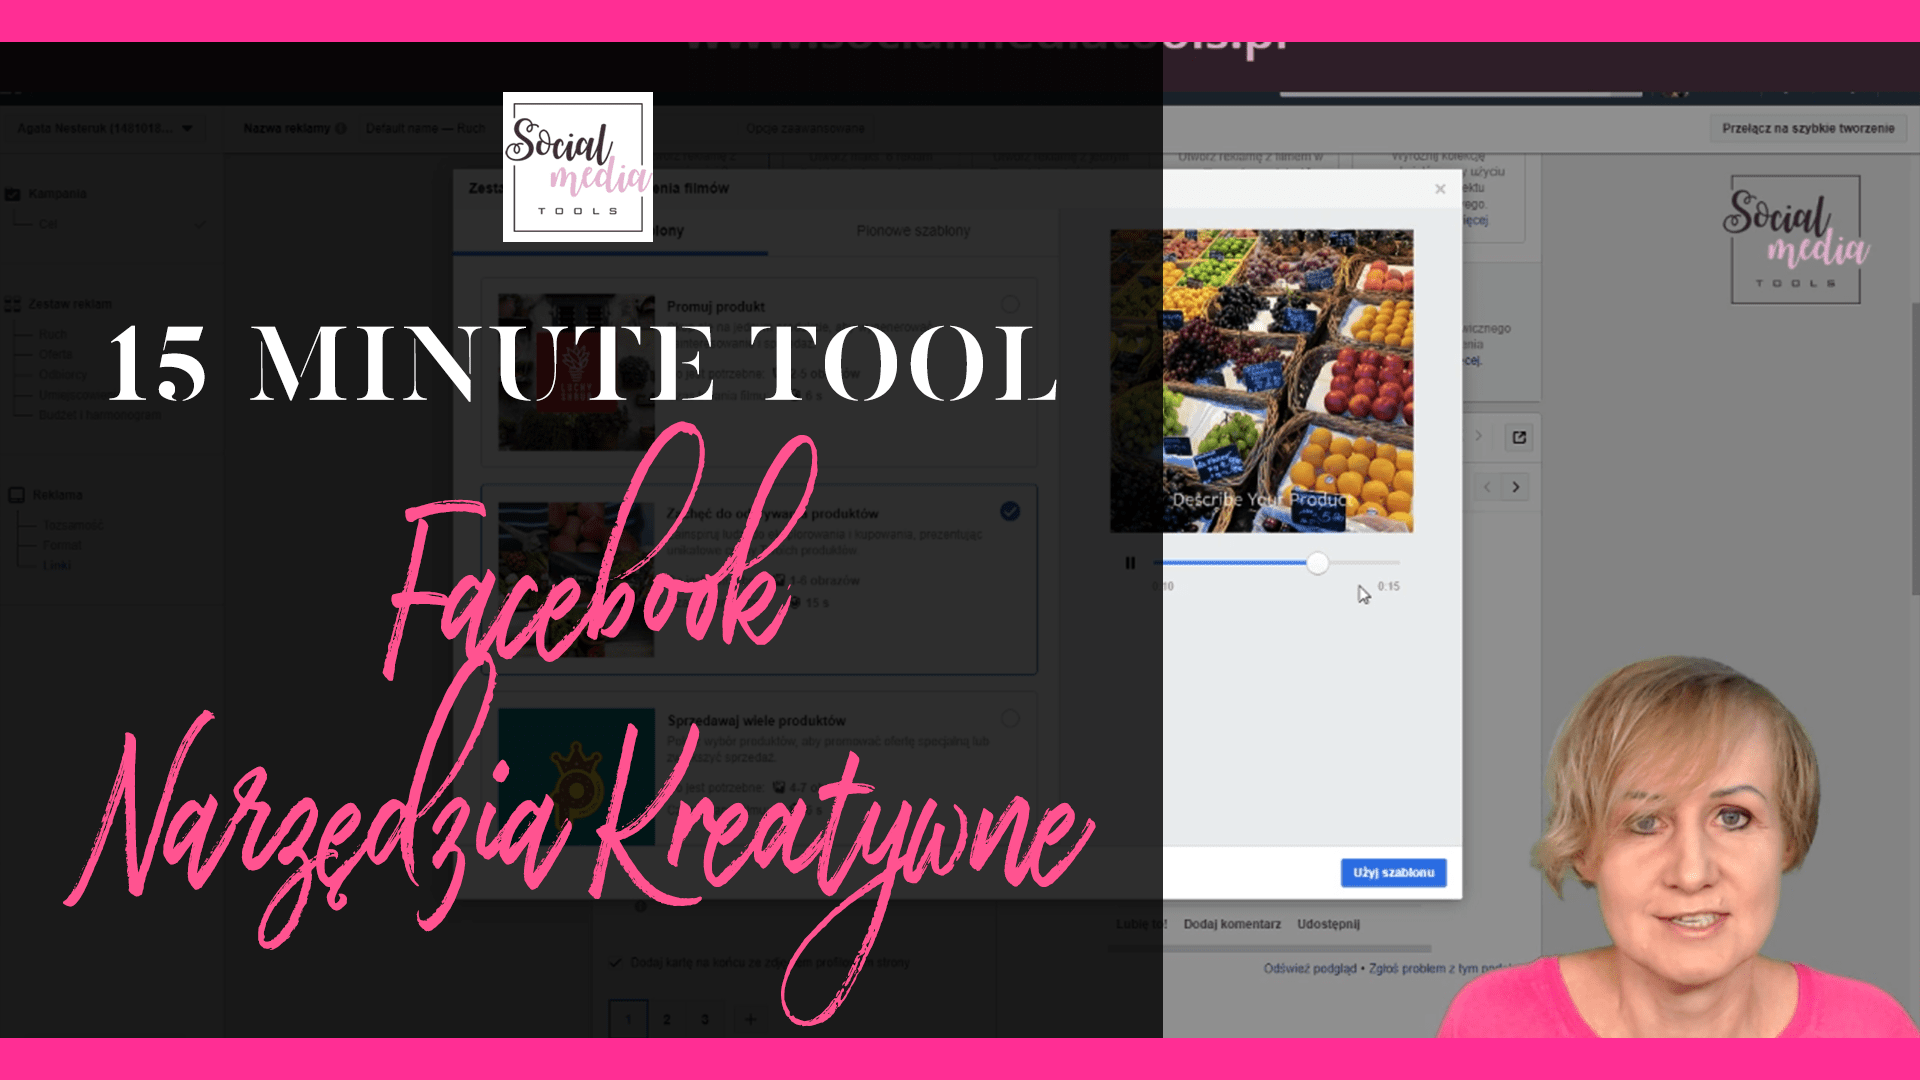 facebook narzędzia kreatywne